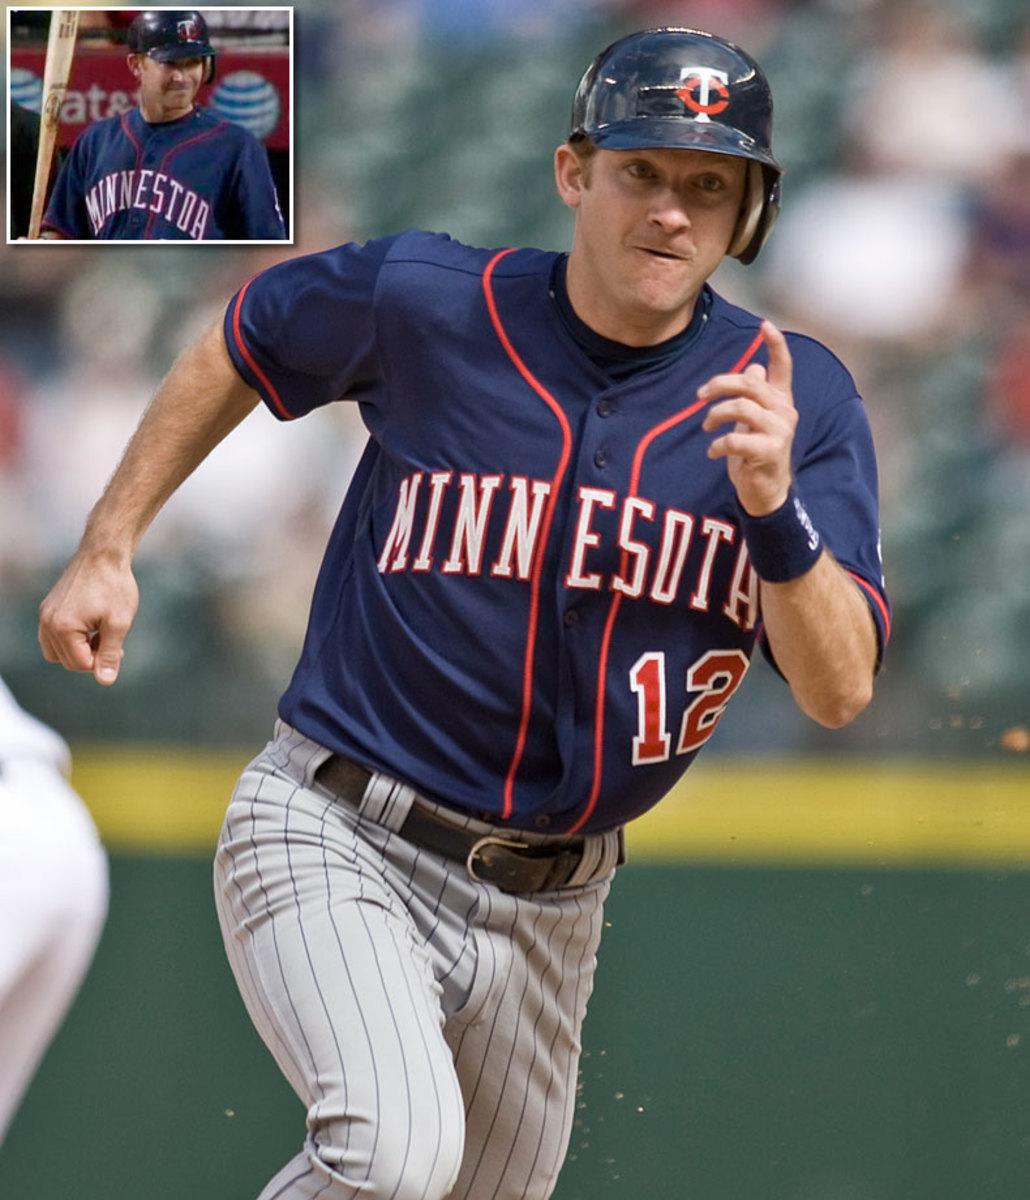 Adam-Everett-MINNESTOA-jersey.jpg